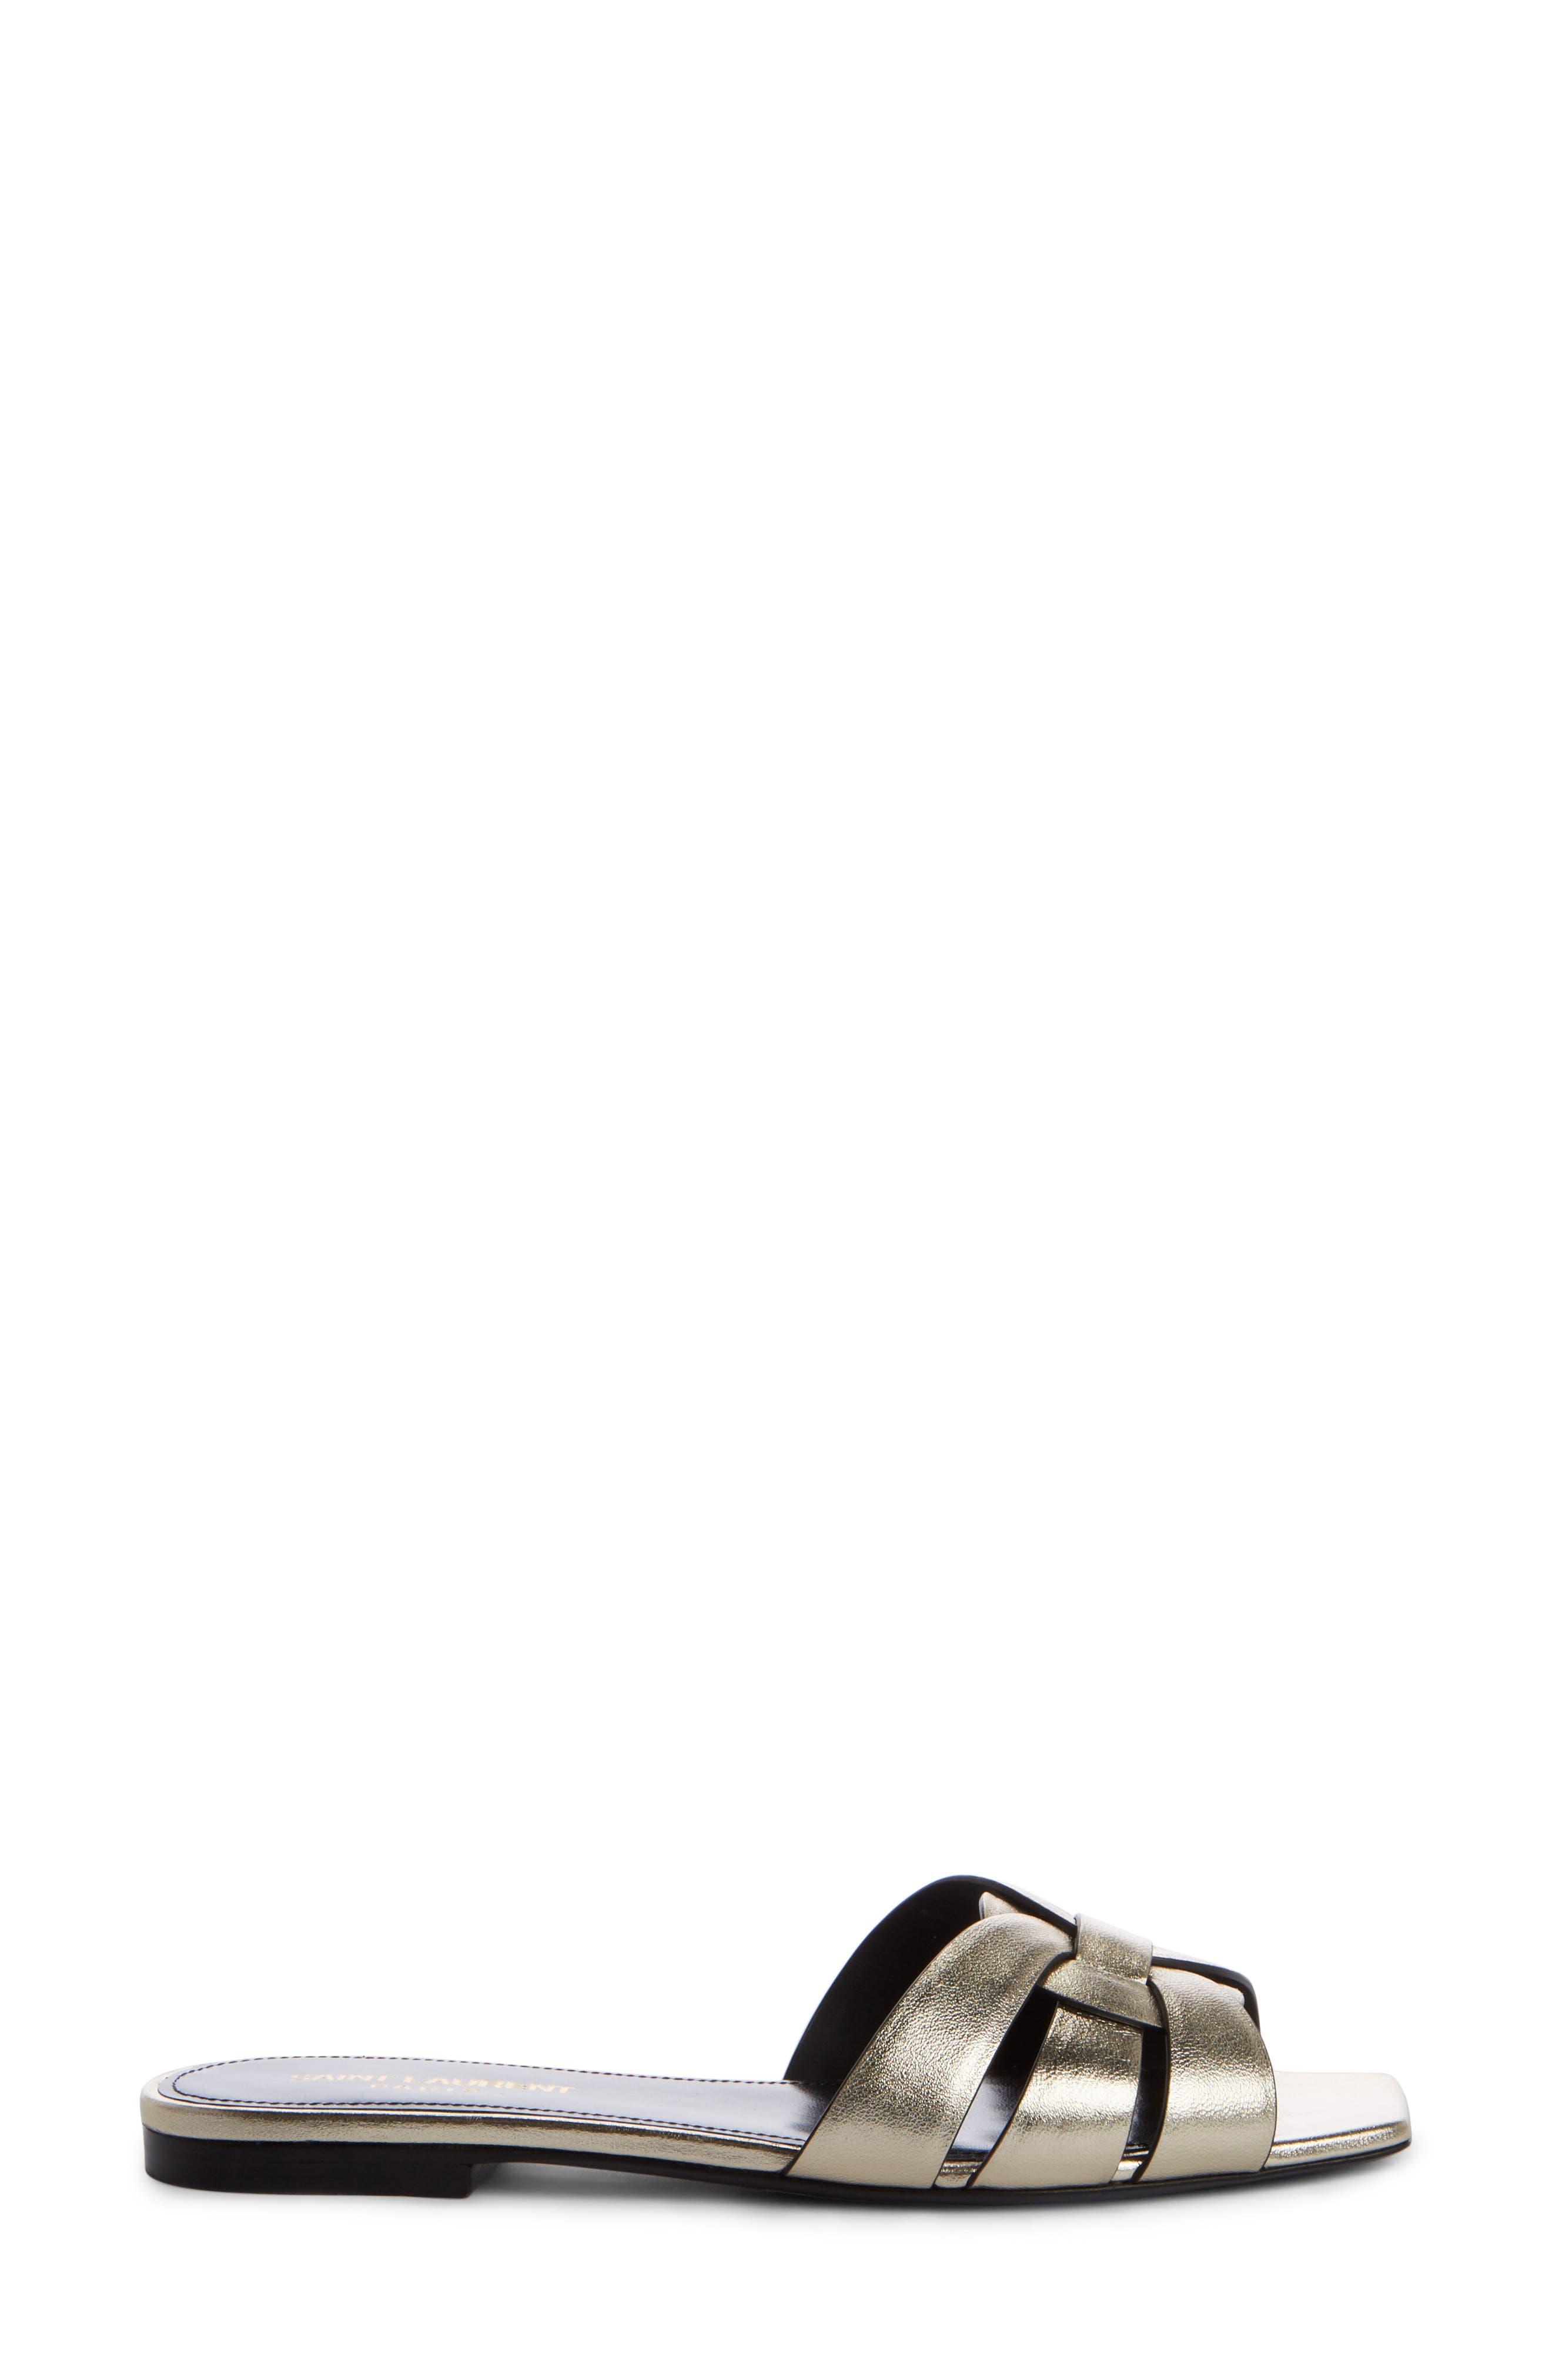 Nu Pieds Strappy Slide Sandal,                             Alternate thumbnail 3, color,                             7100 OR PALE